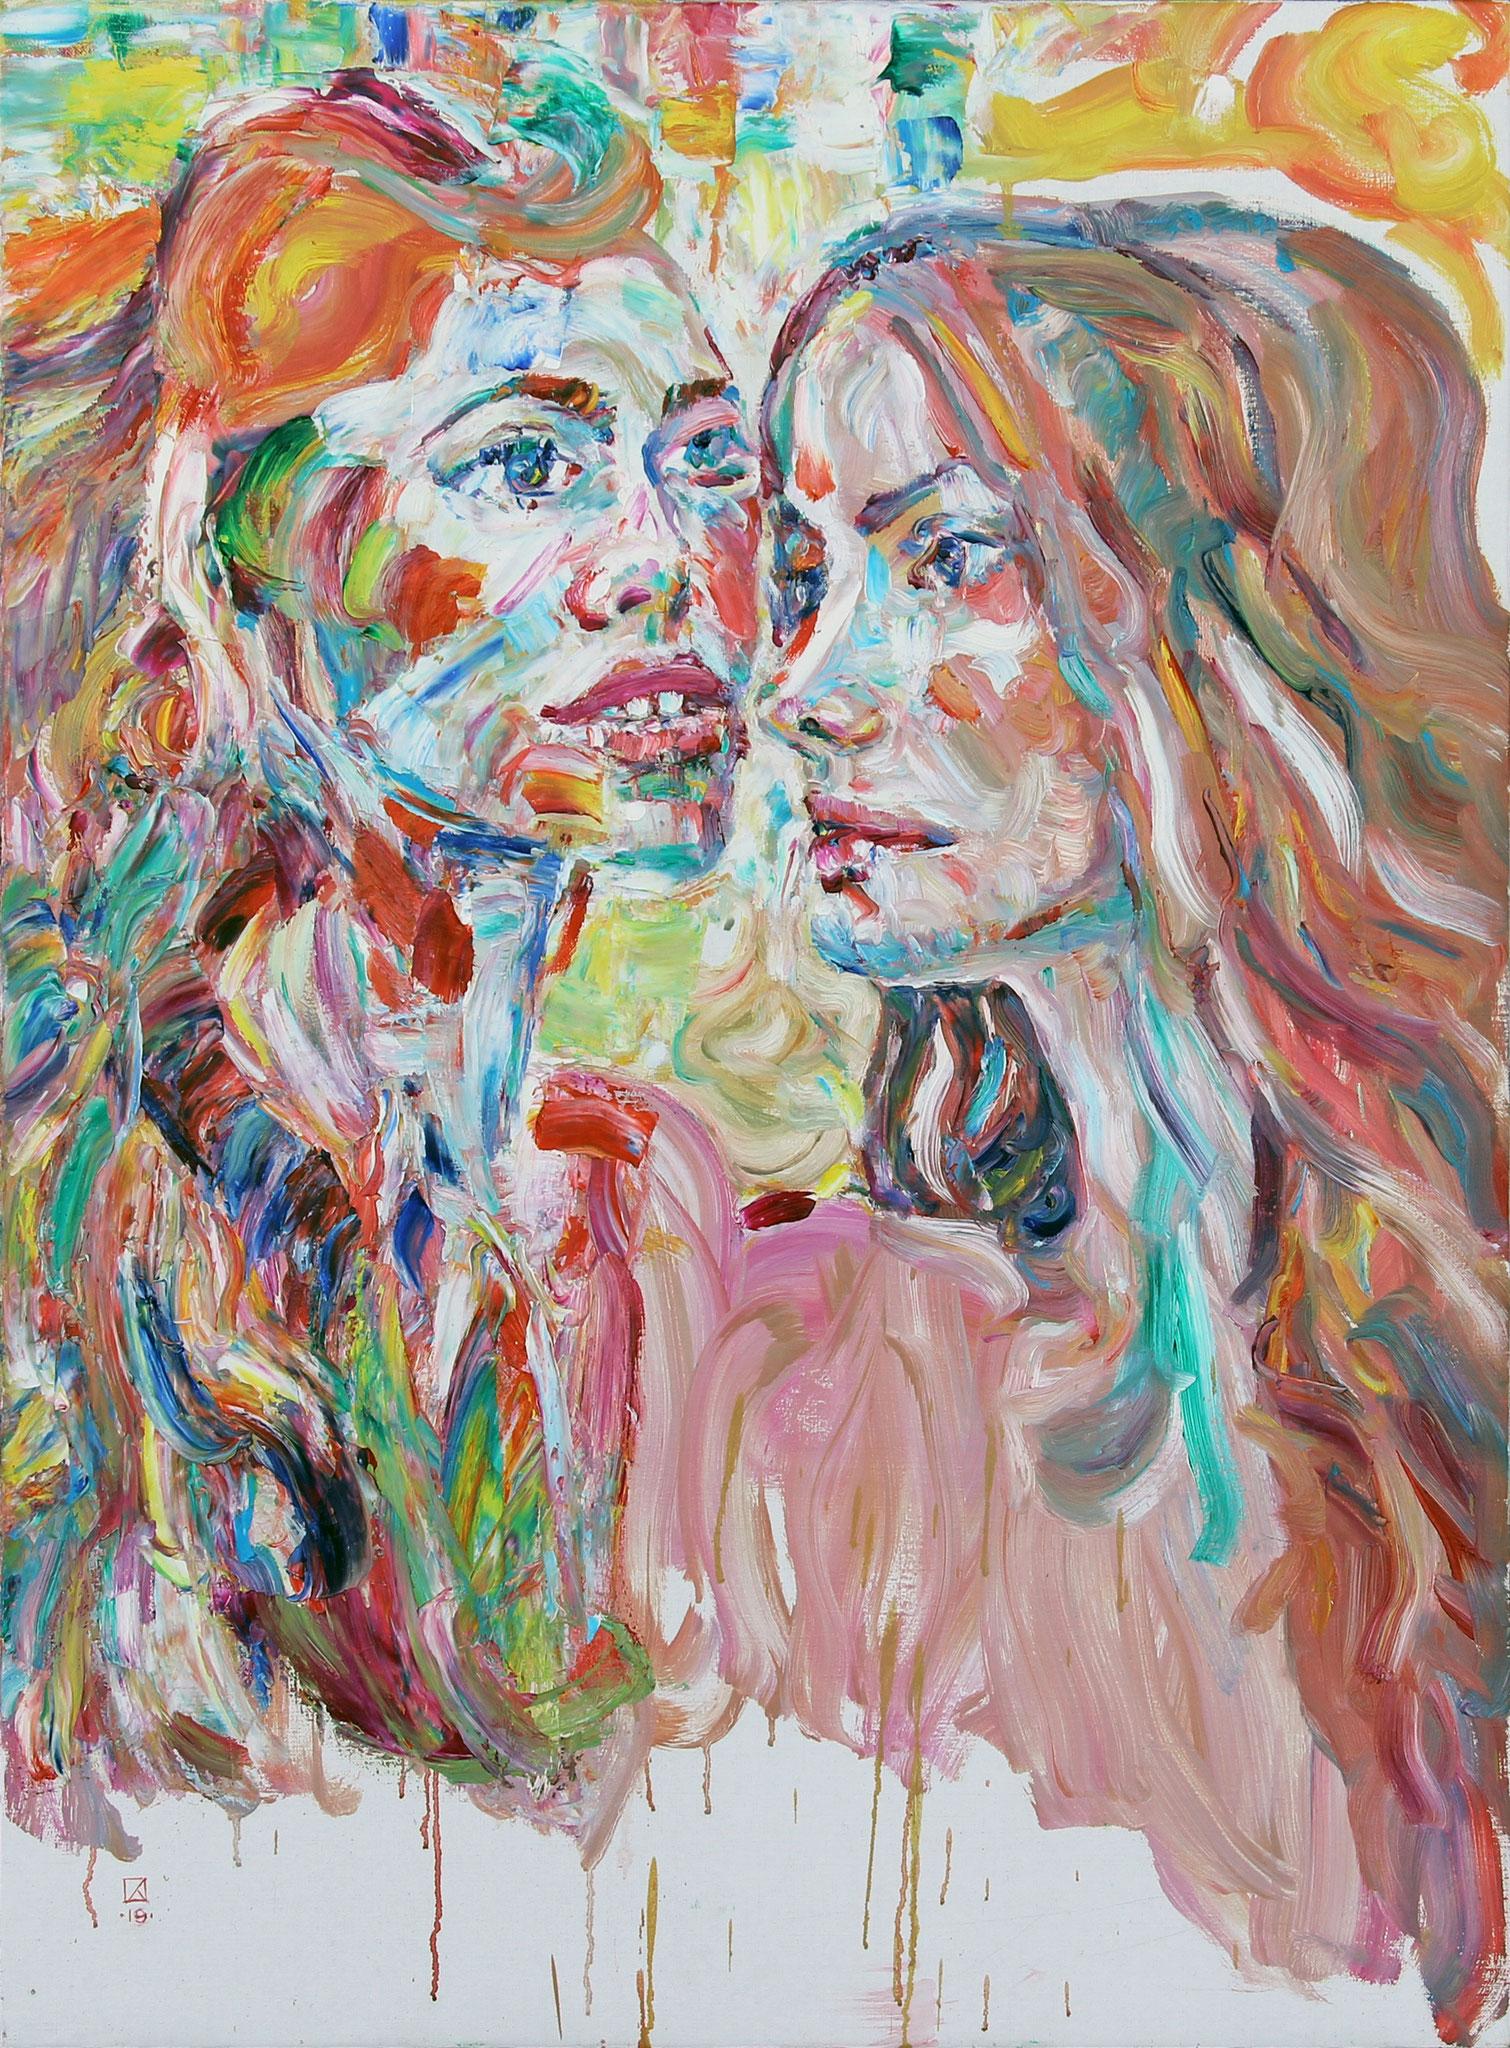 Twee Jonge Meusjes. Double Portrait. 2019. Oil on canvas. 95 x 70